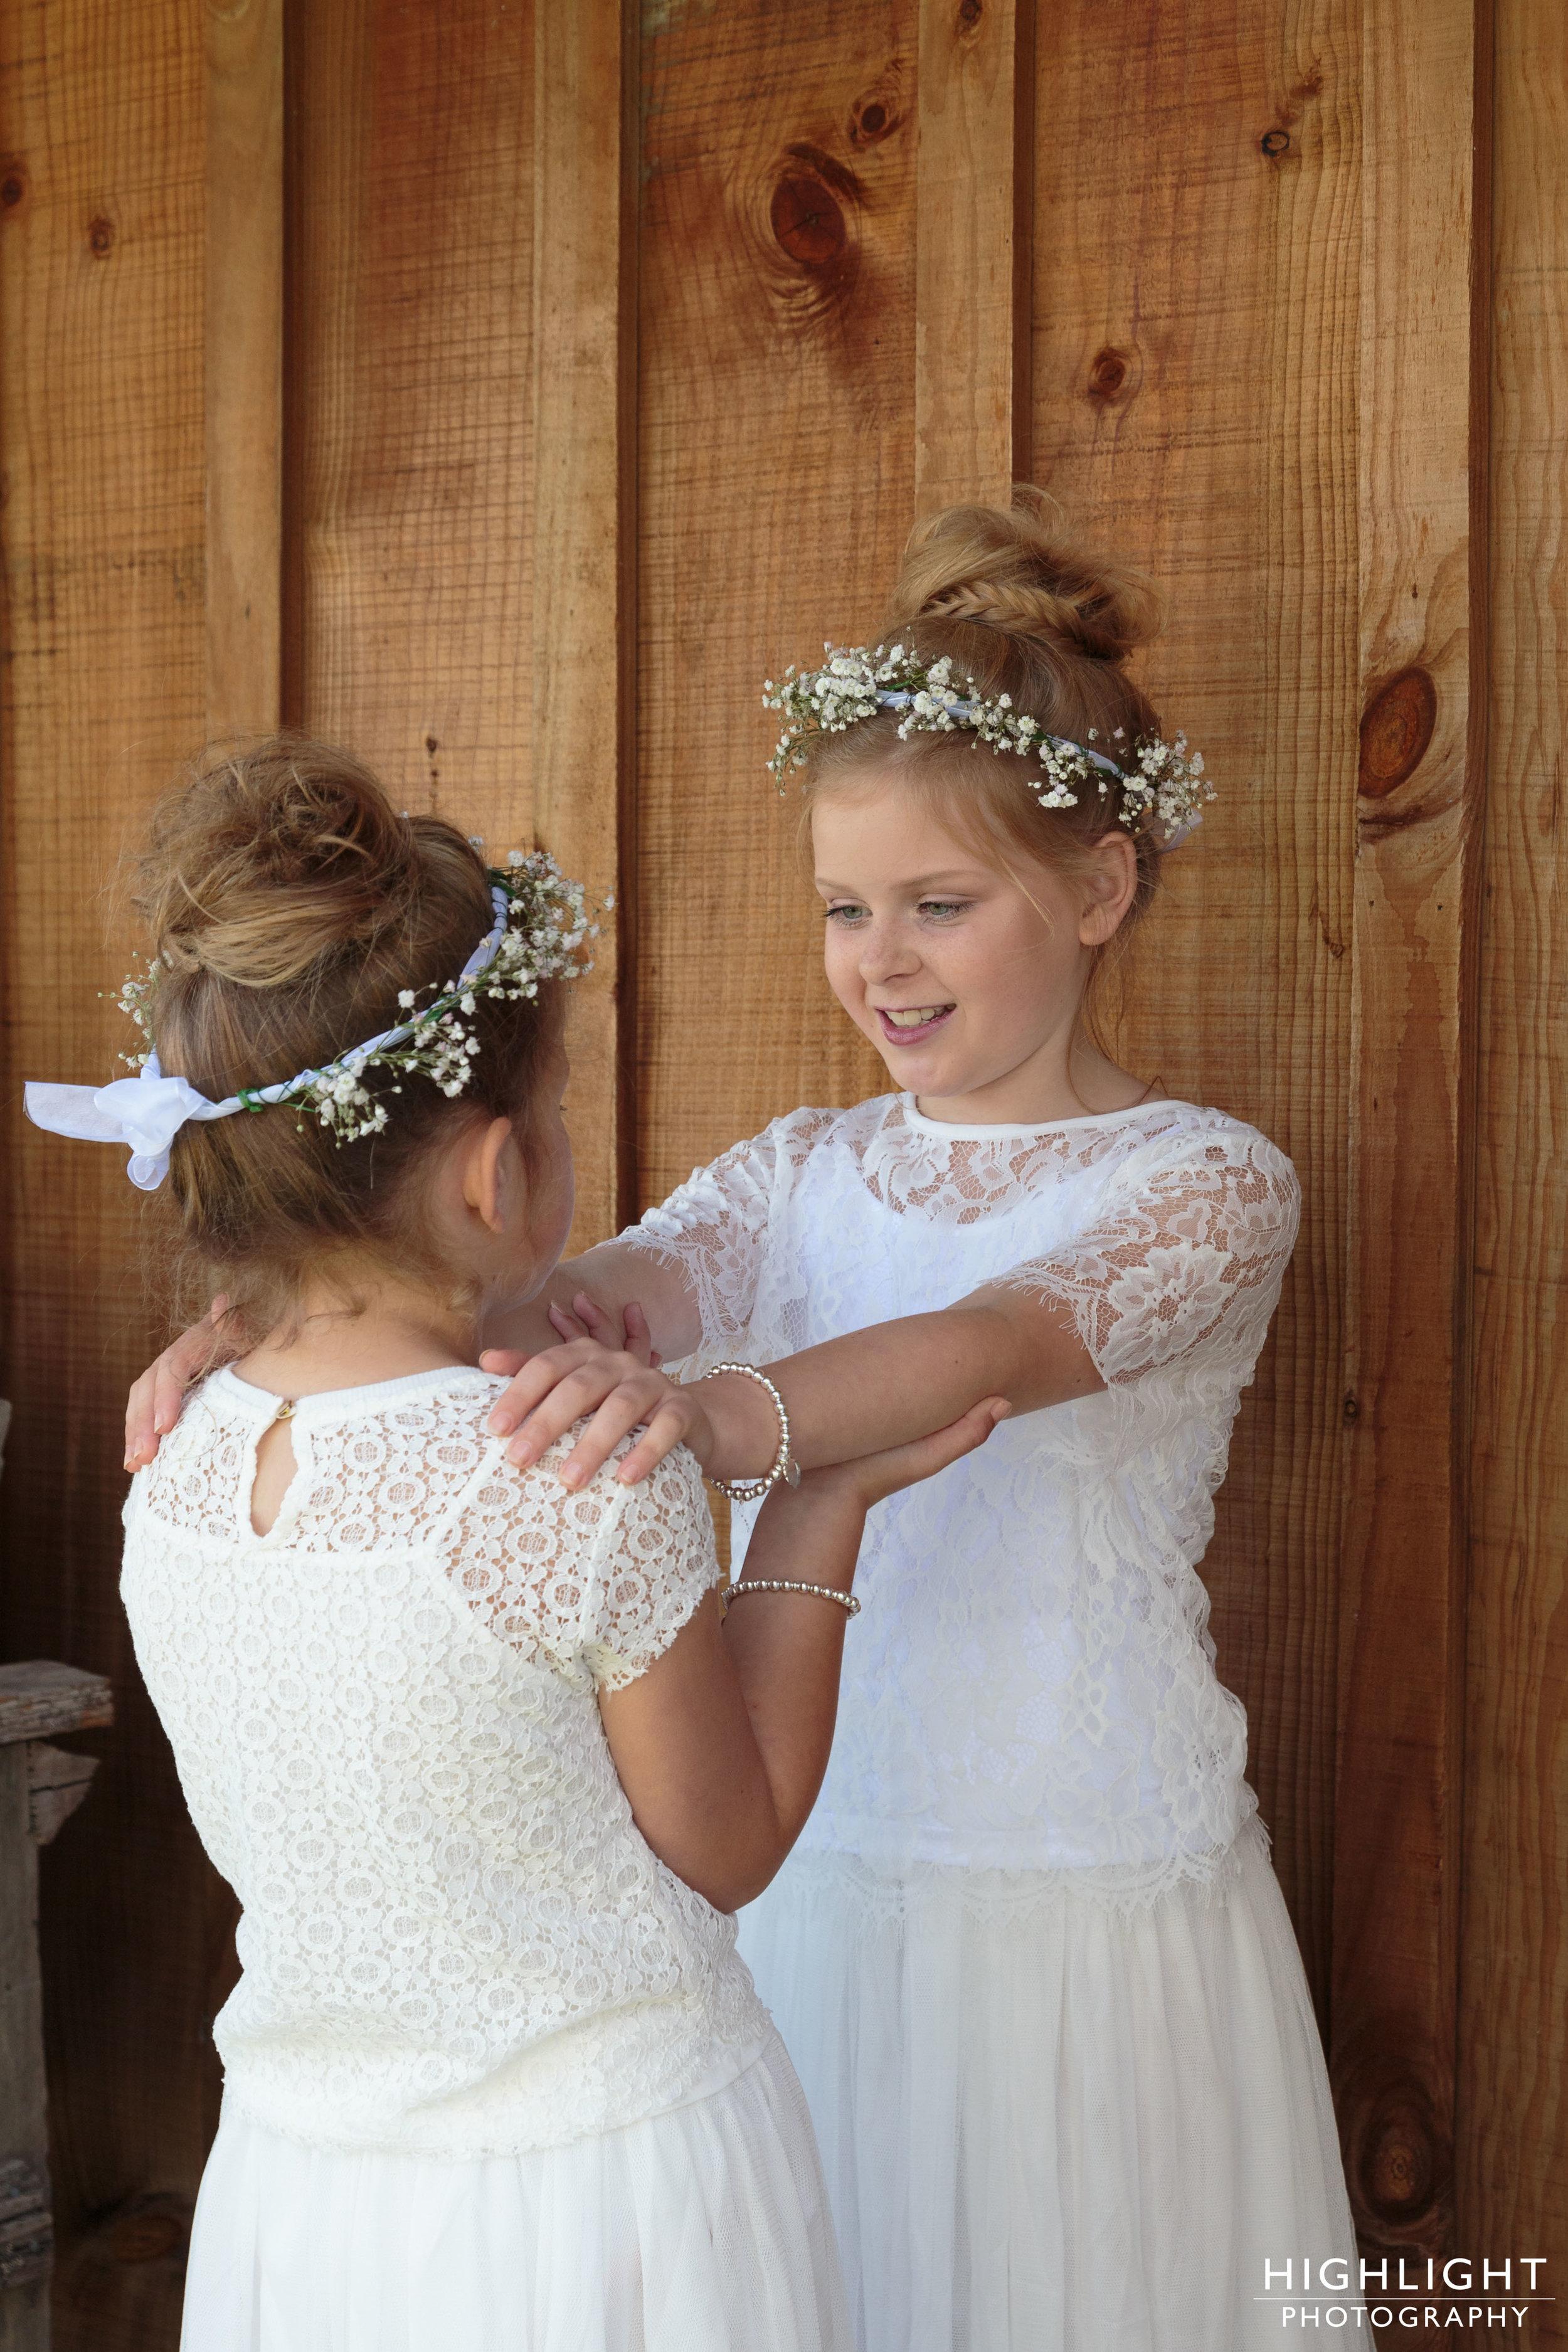 highlight_wedding_photography_makoura_lodge_manawatu_new_zealand-27.jpg